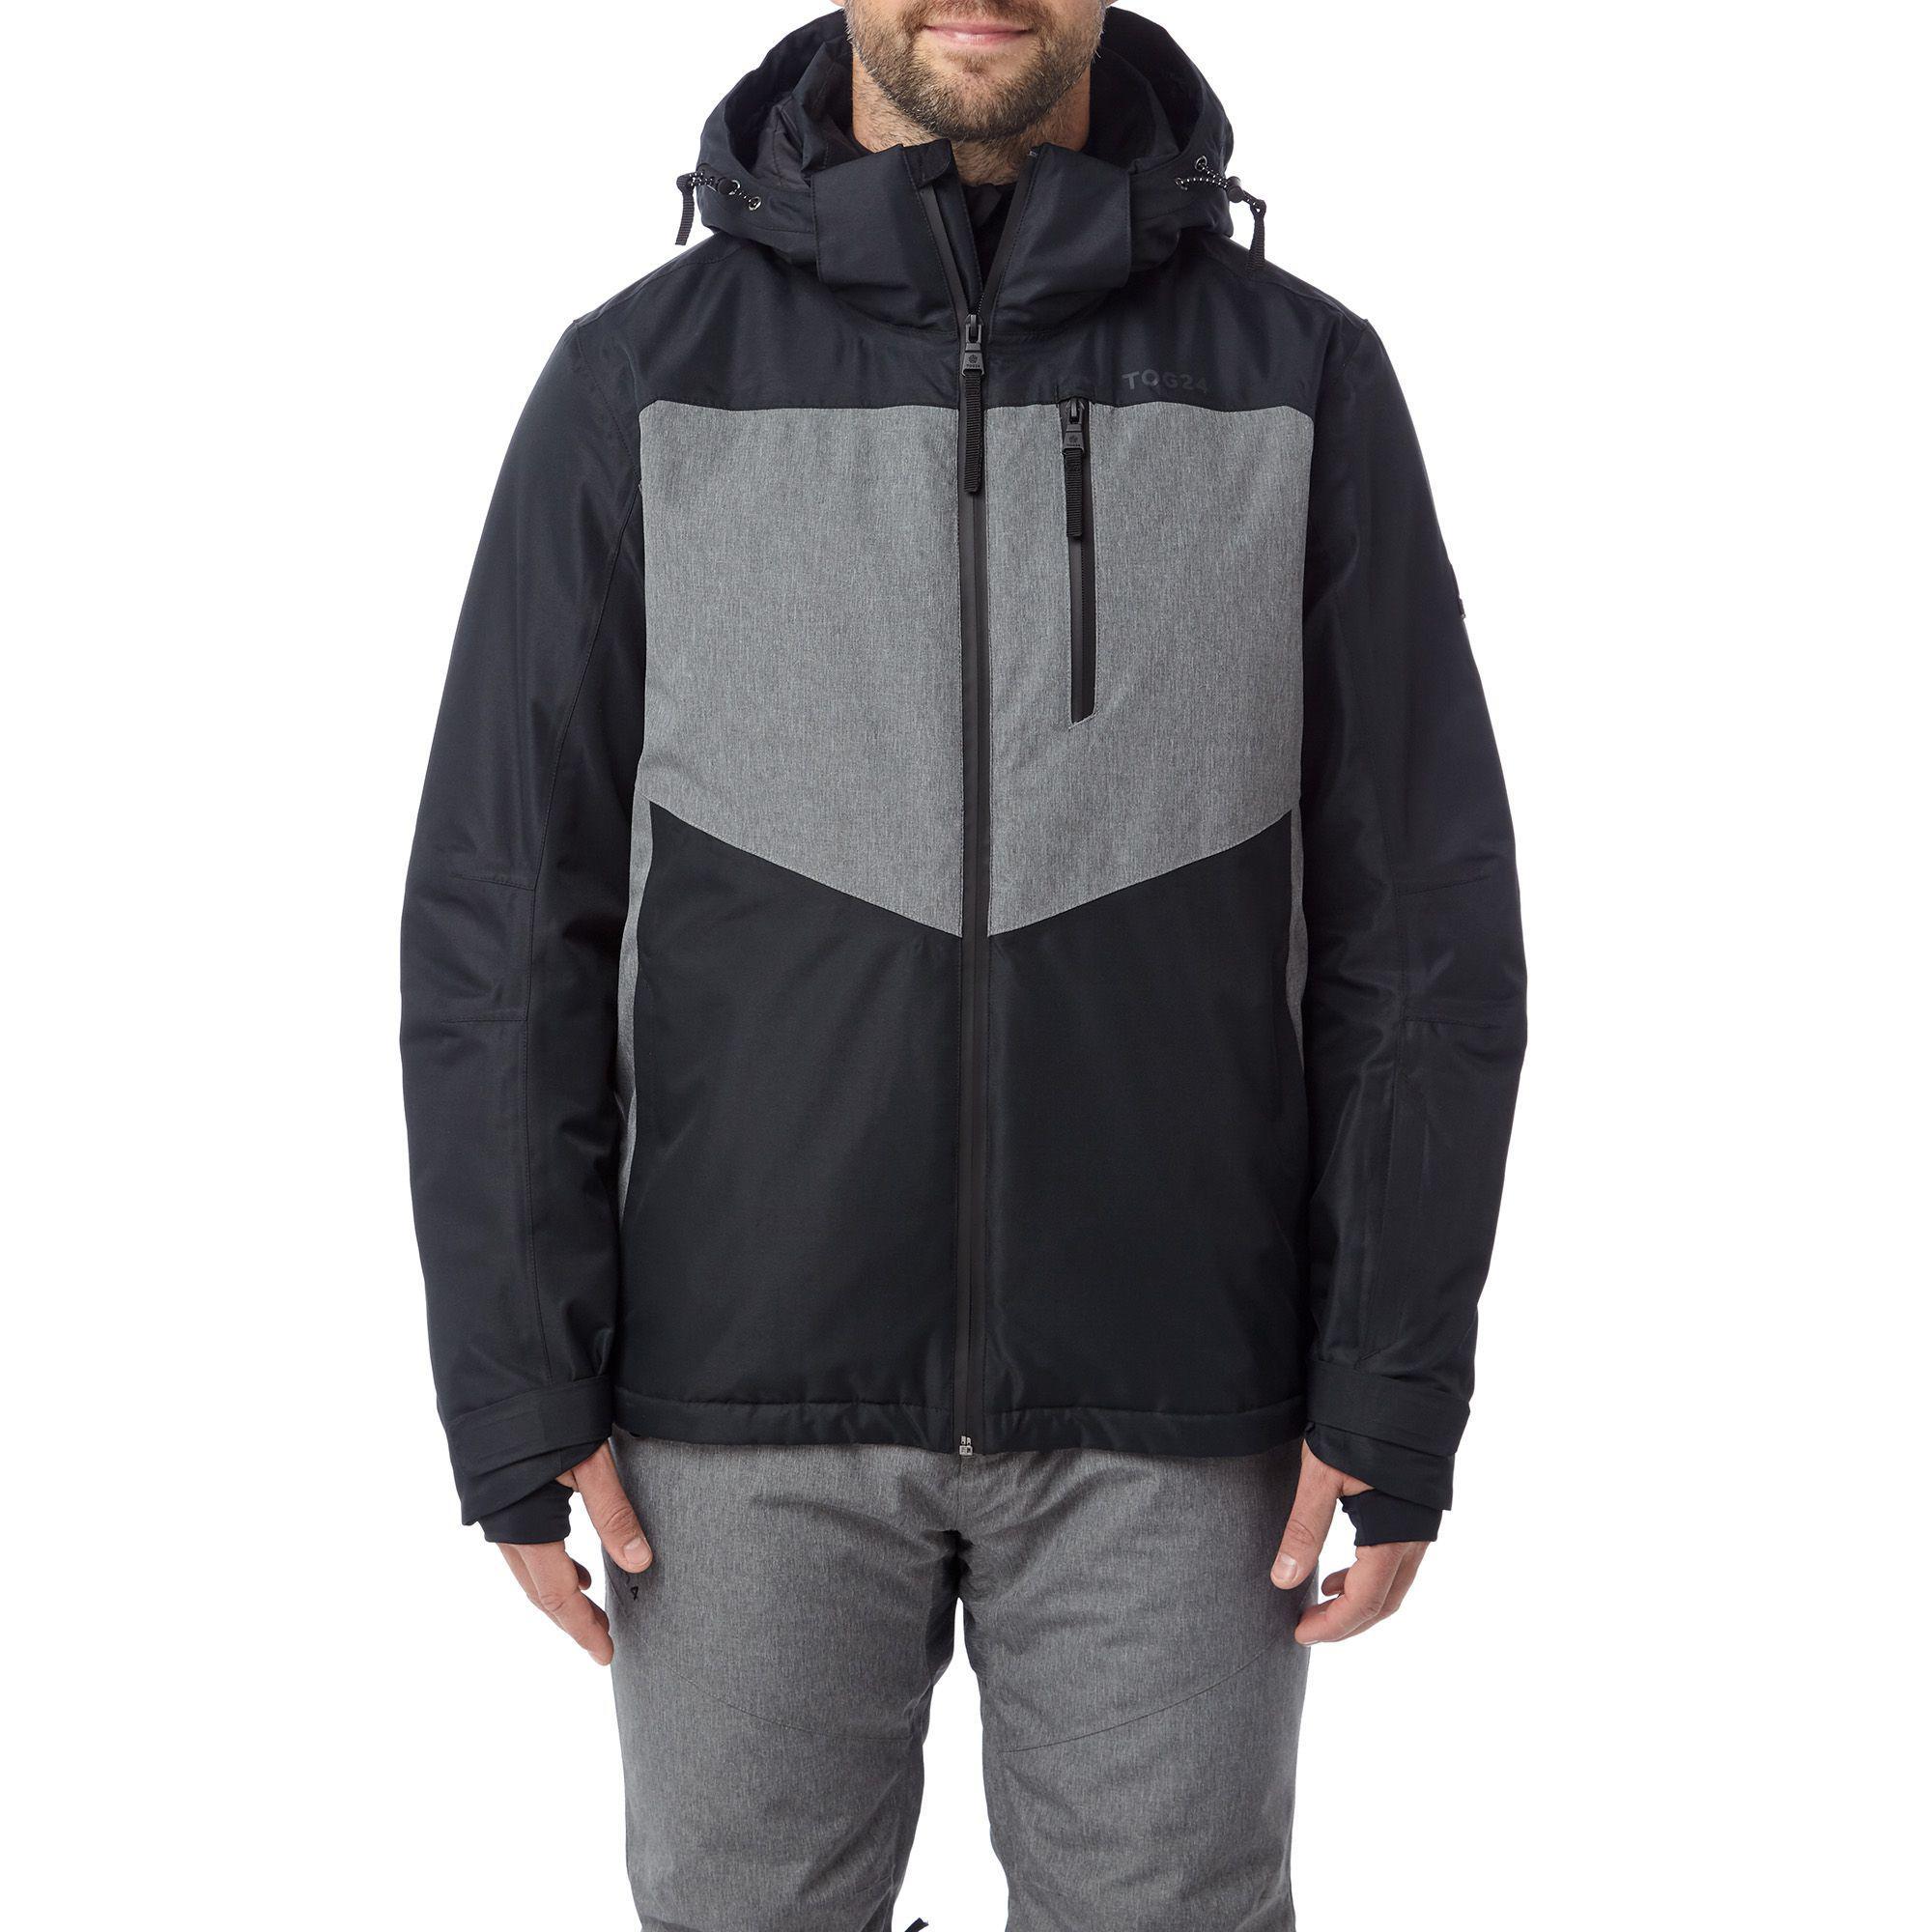 ... Grey Marl Blade Mens Insulated Ski Jacket for Men -. View fullscreen 340130790